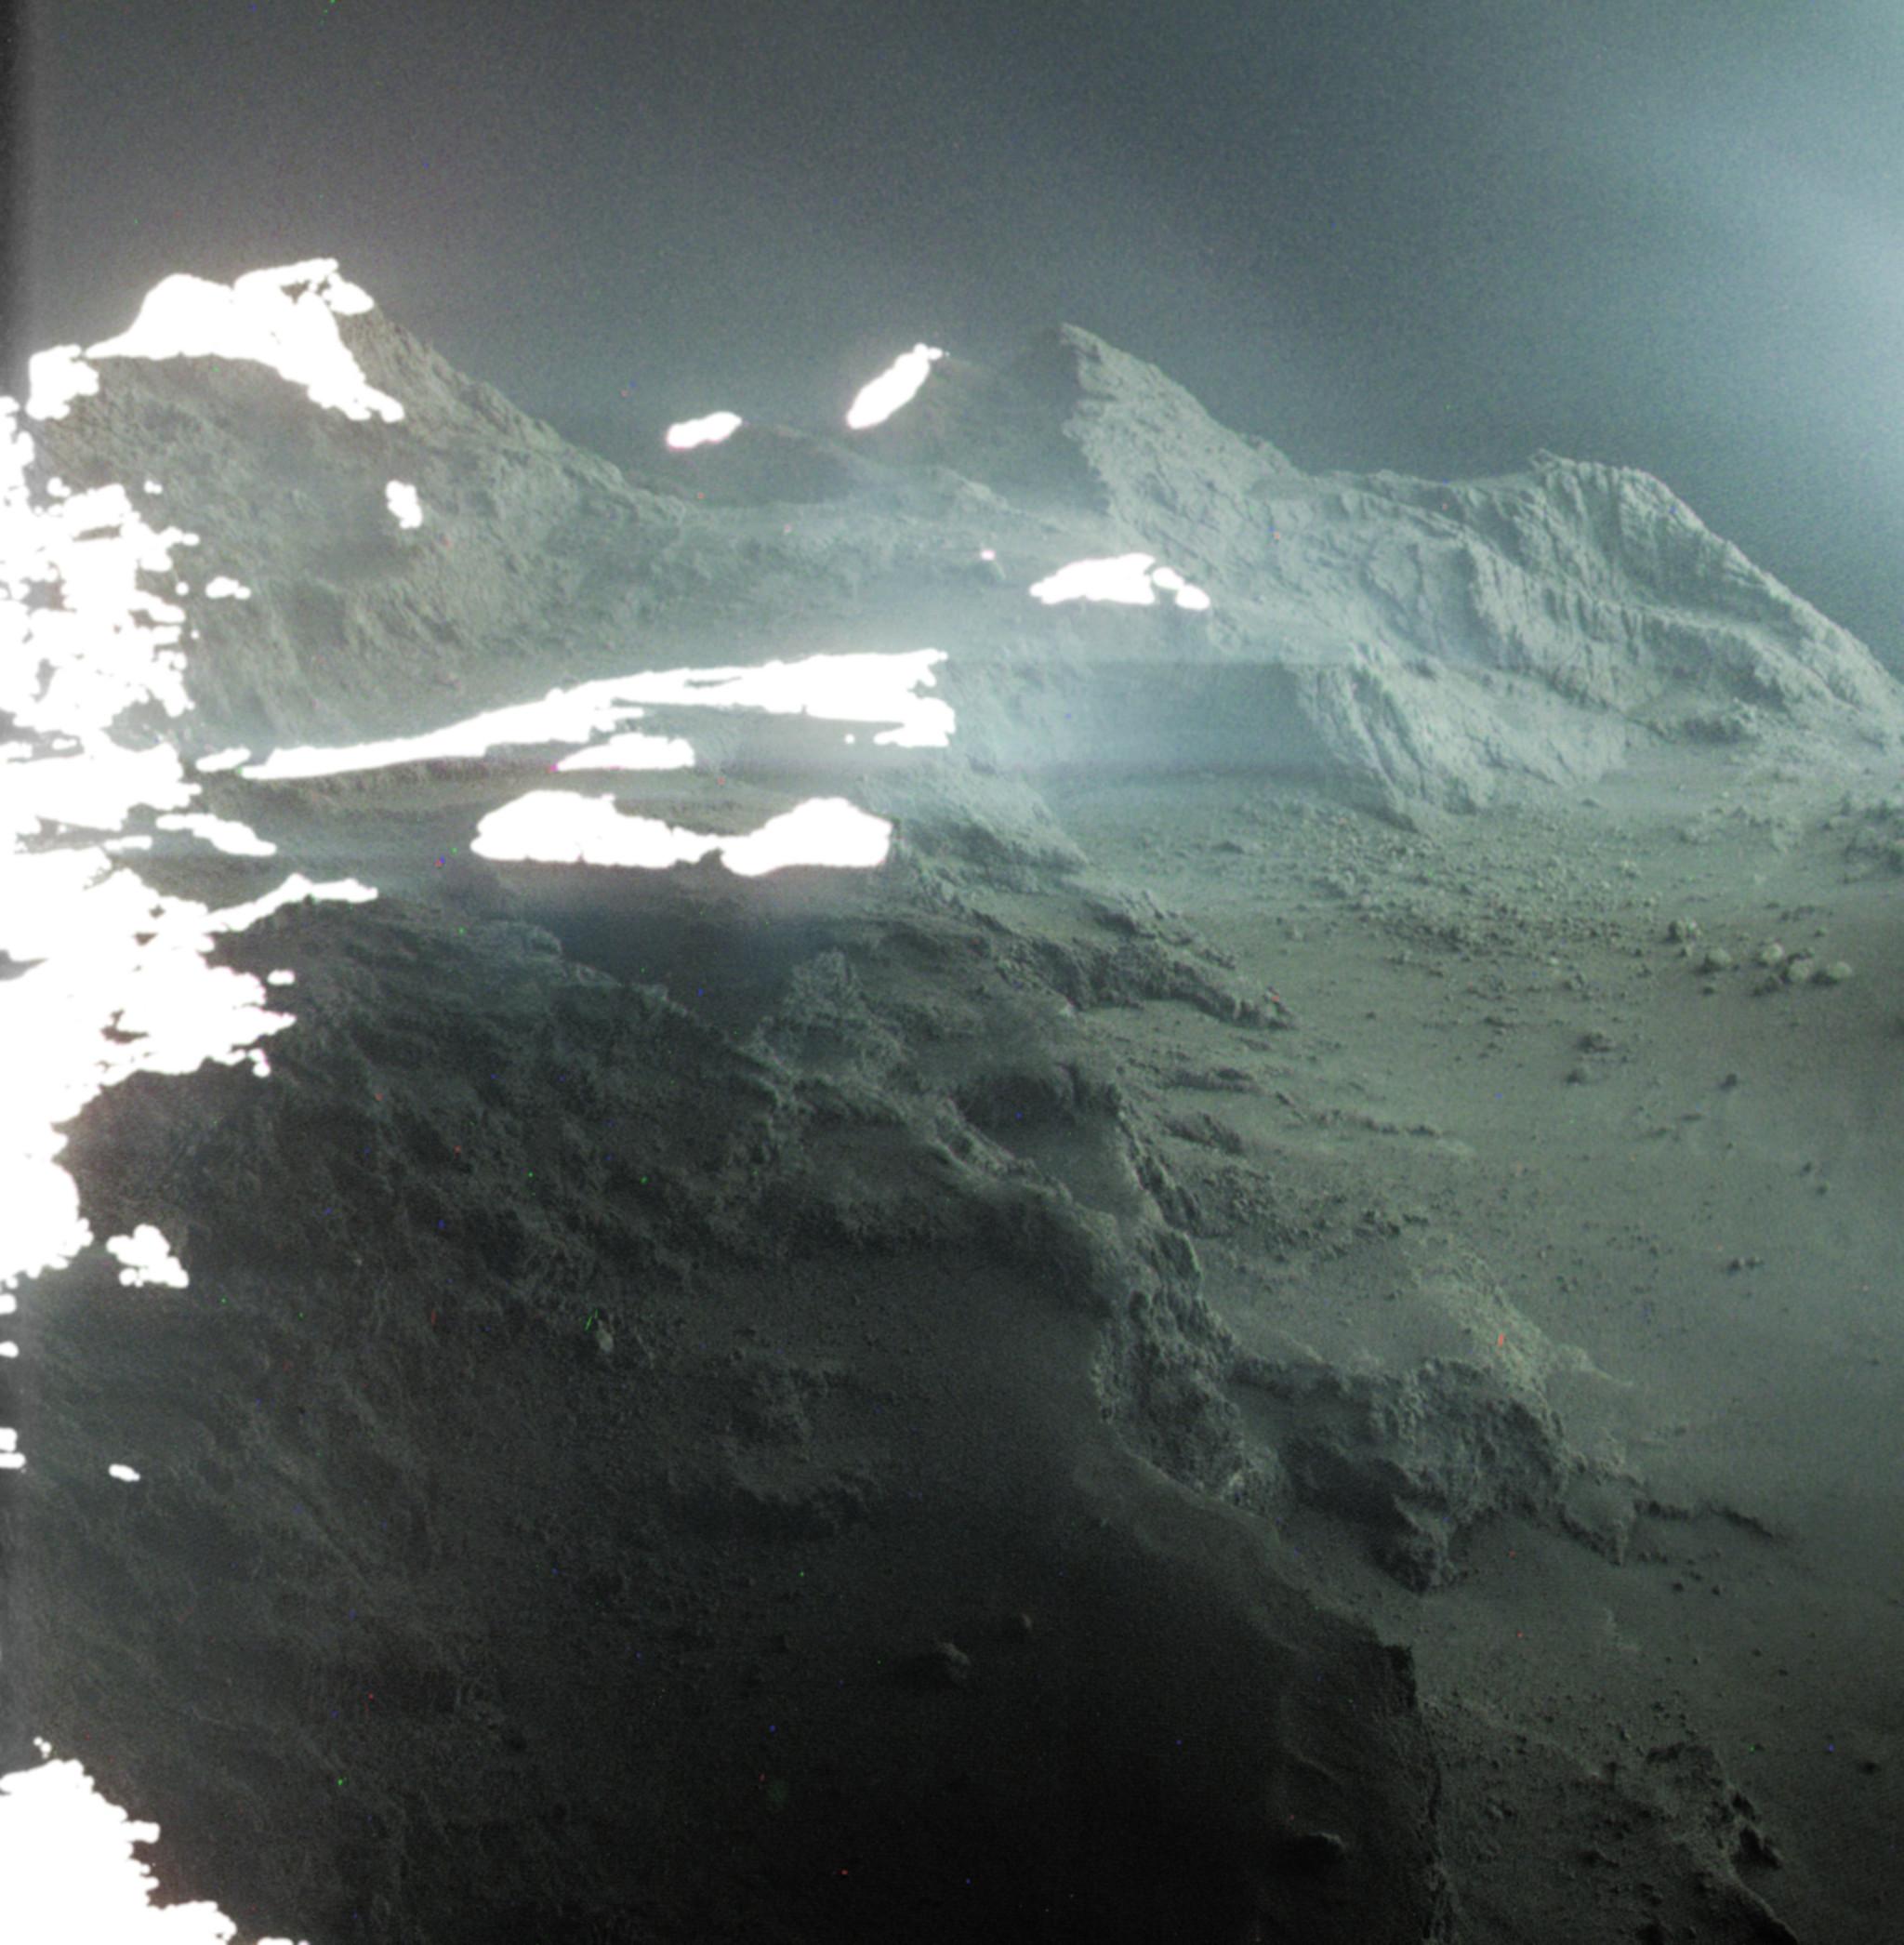 Comet_landscape.png